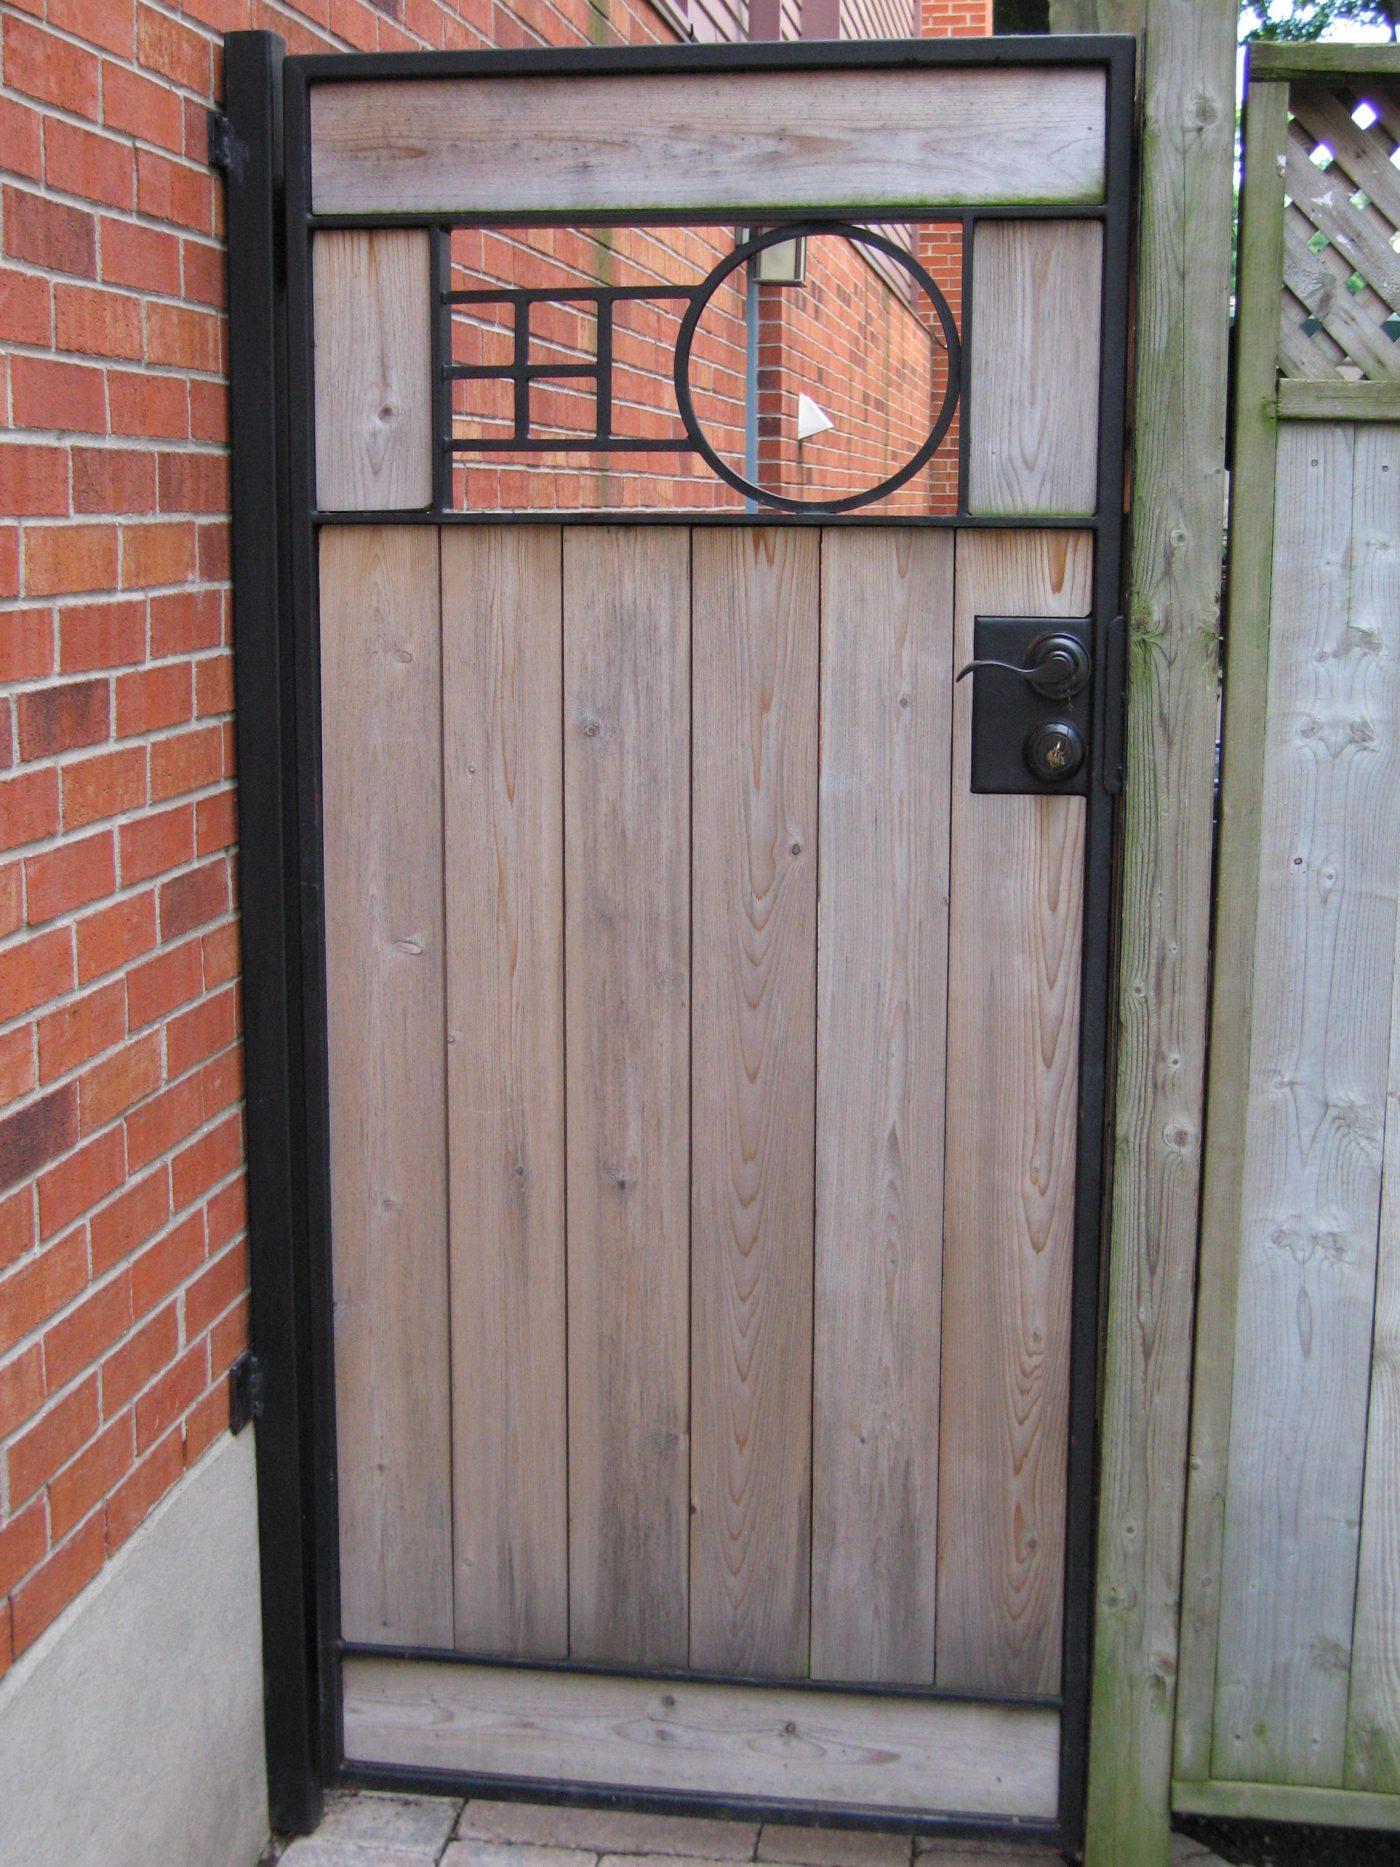 Nightingale gate- 503 Ballioil_002